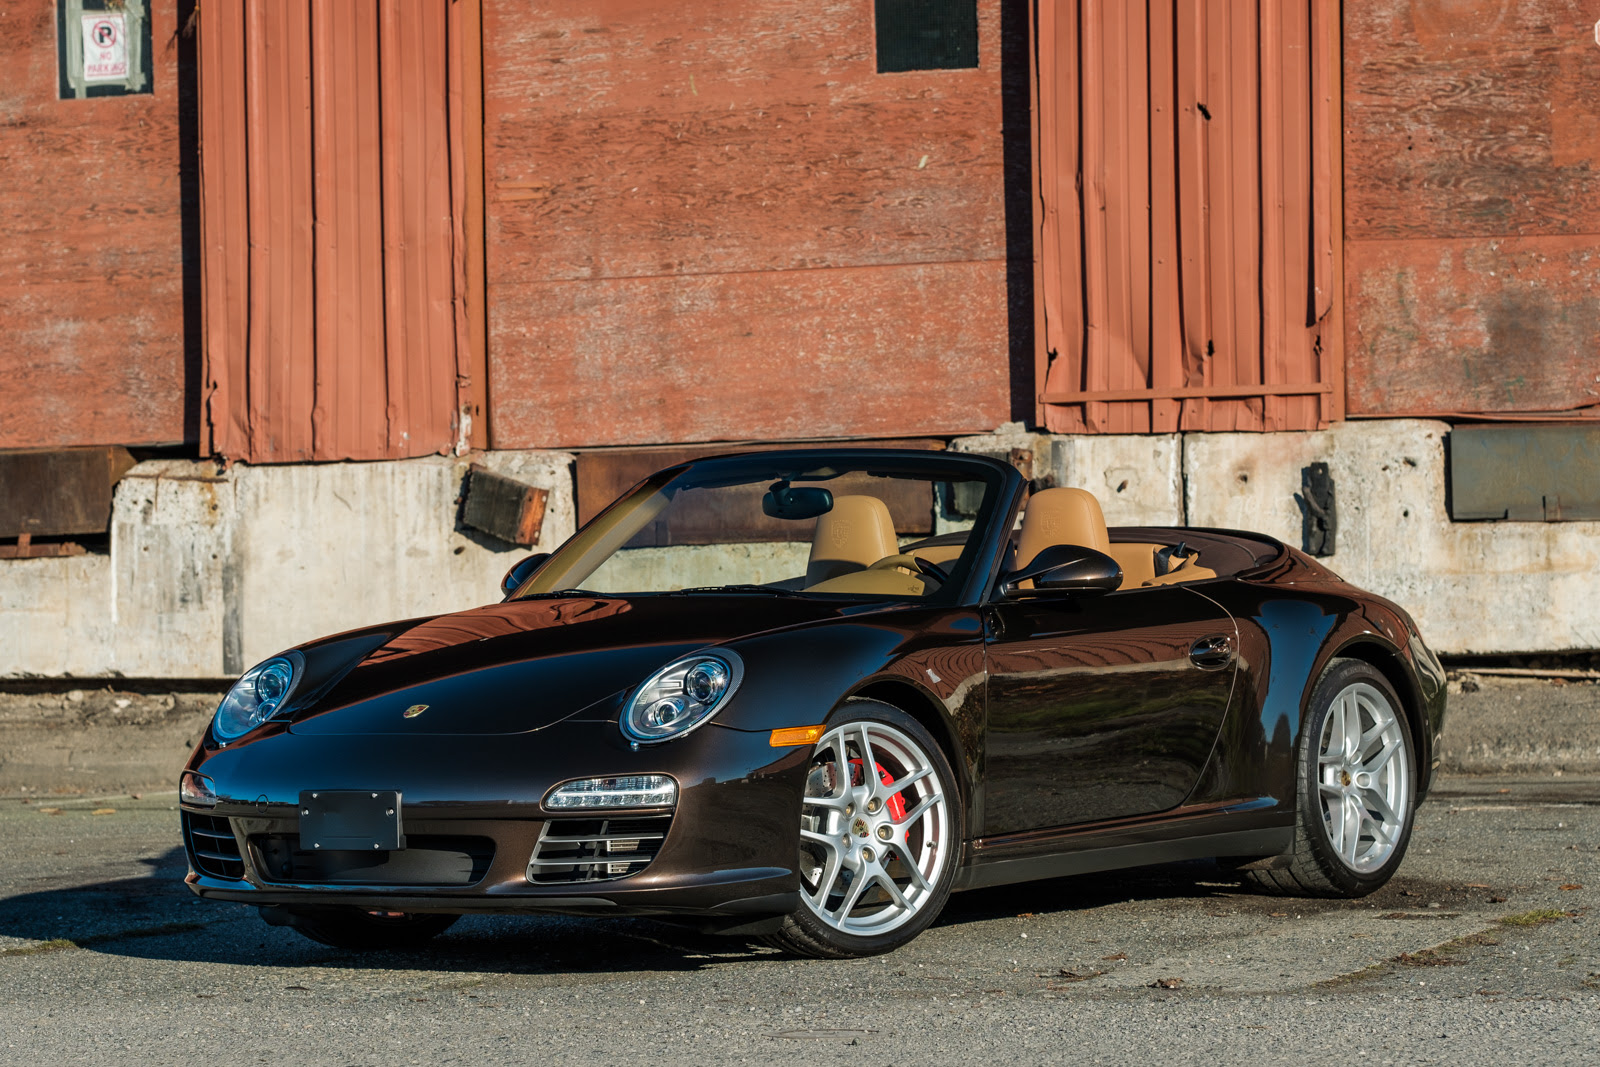 2012 Porsche 911 Carrera 4S Cabriolet - Silver Arrow Cars Ltd.